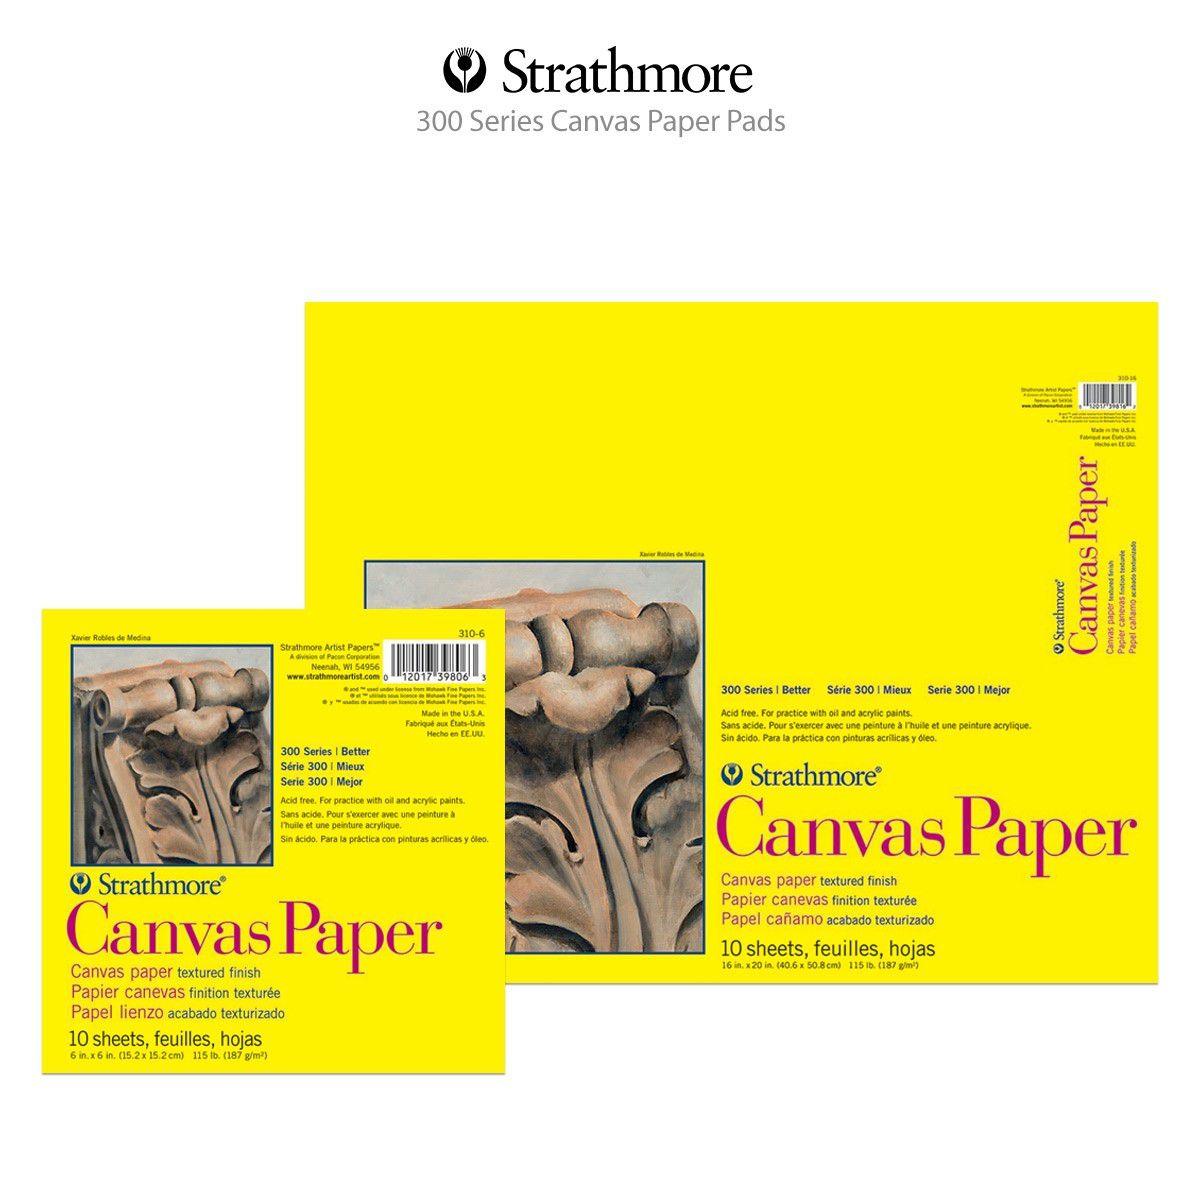 Strathmore (310-9) 300 Series Canvas Pad